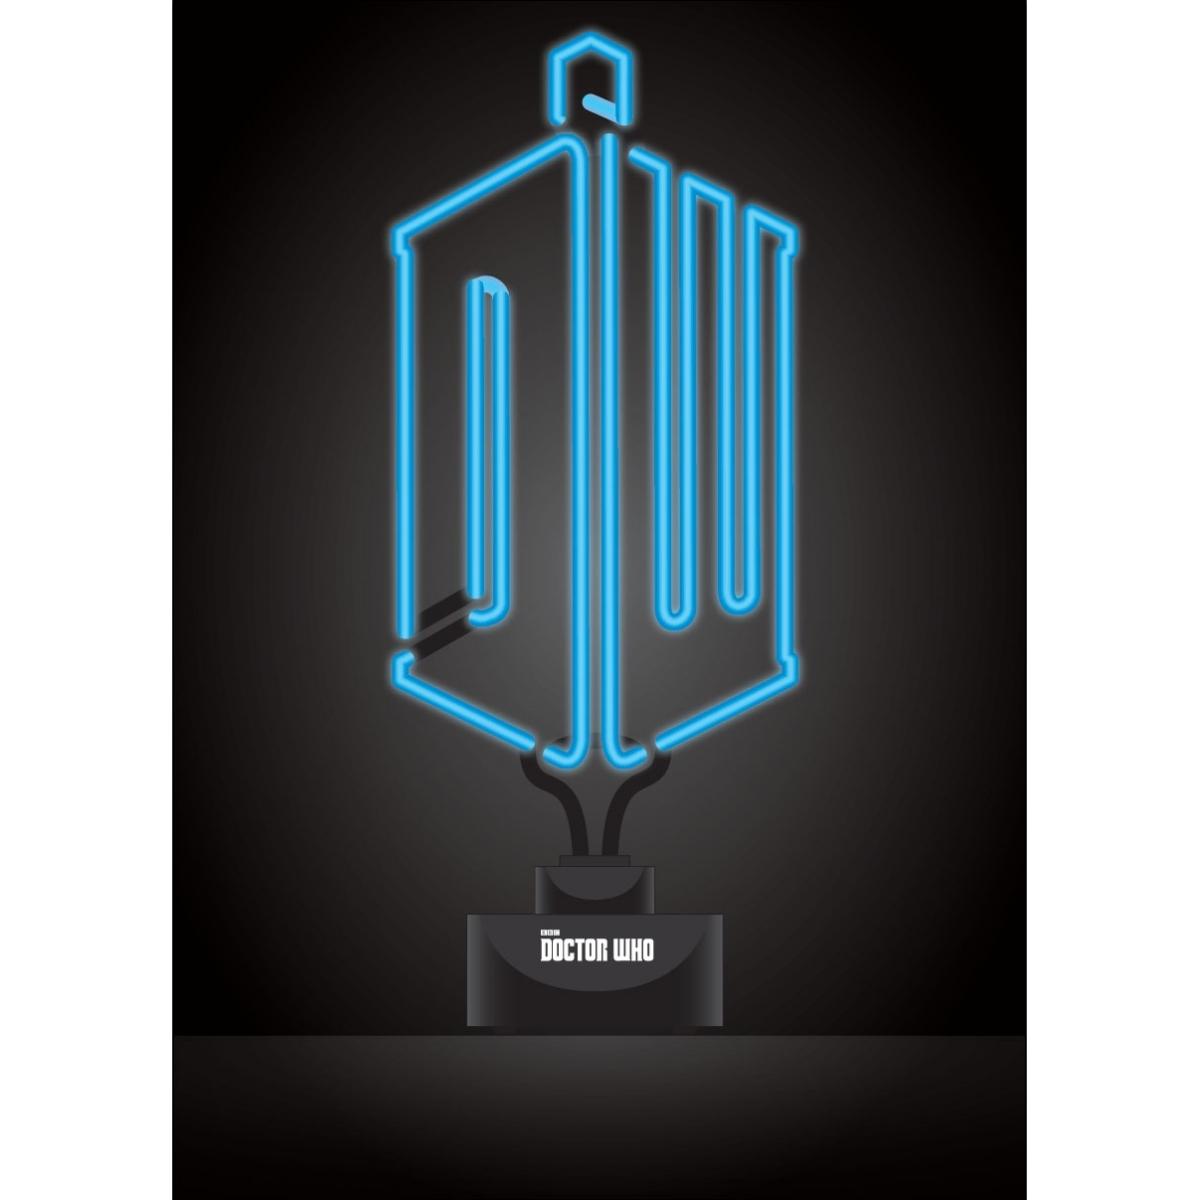 doctor who lampe neon logo 20 x 44 cm figurine discount. Black Bedroom Furniture Sets. Home Design Ideas